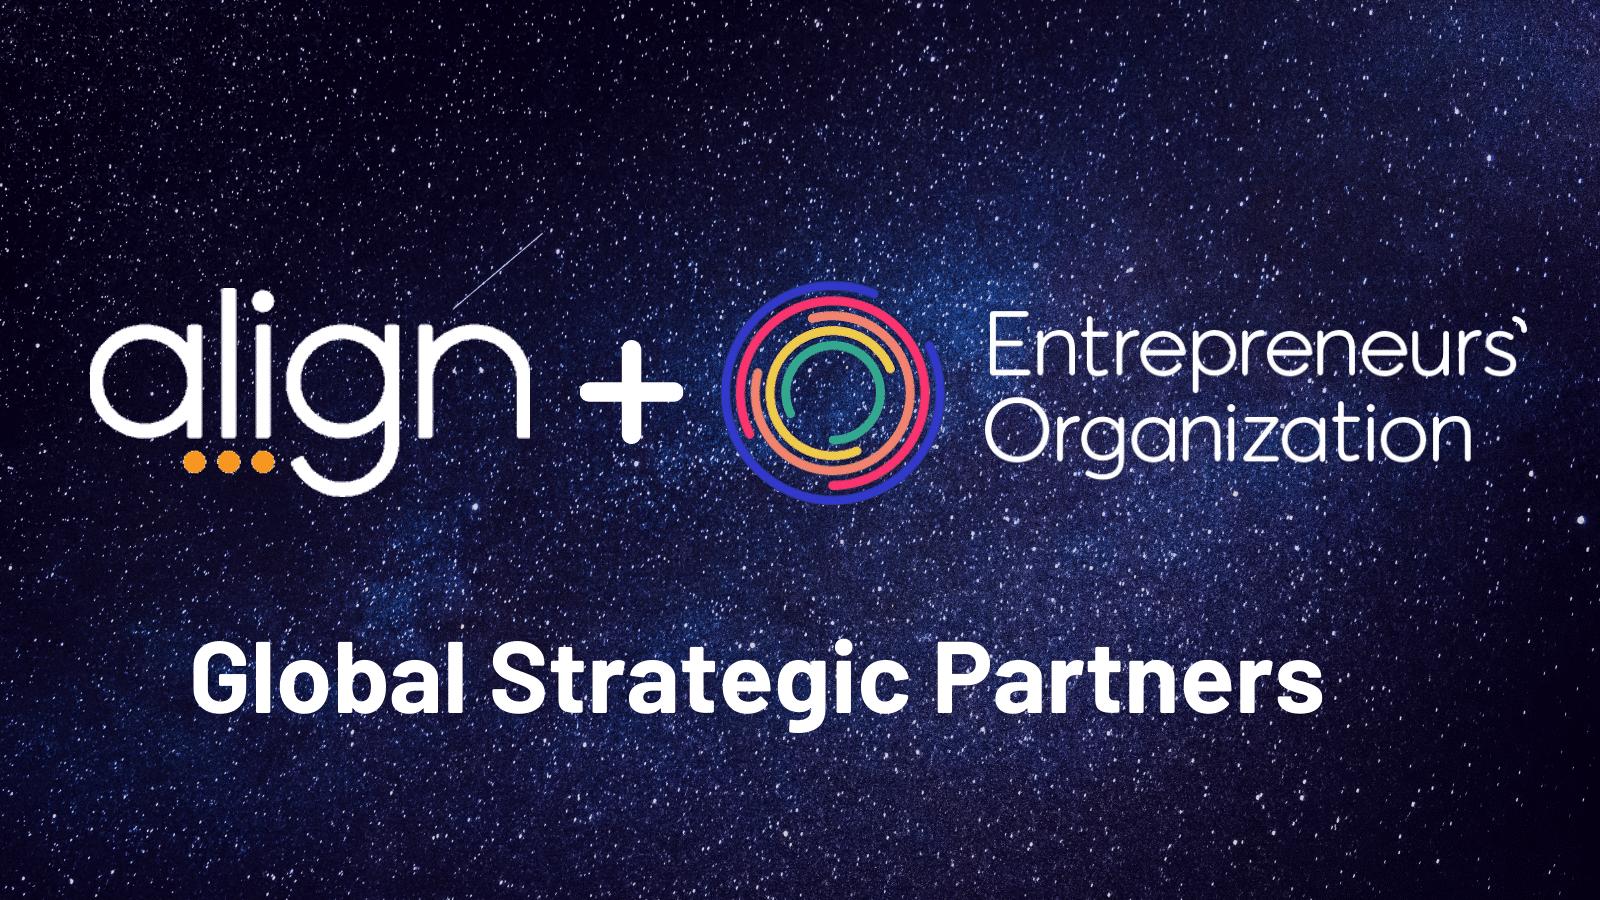 entrepreneurs organization and align partnership banner